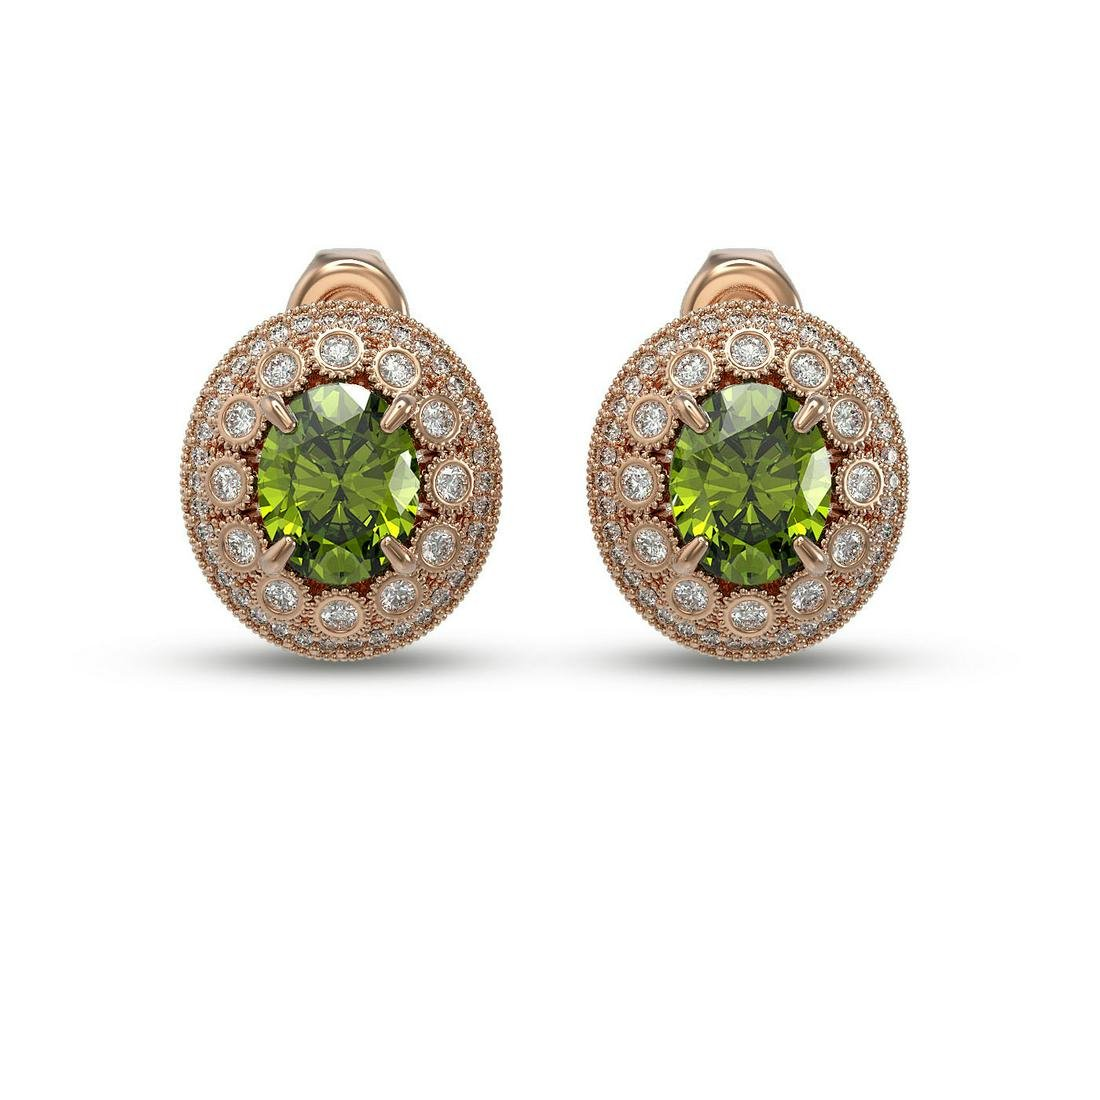 8.04 ctw Tourmaline & Diamond Victorian Earrings 14K